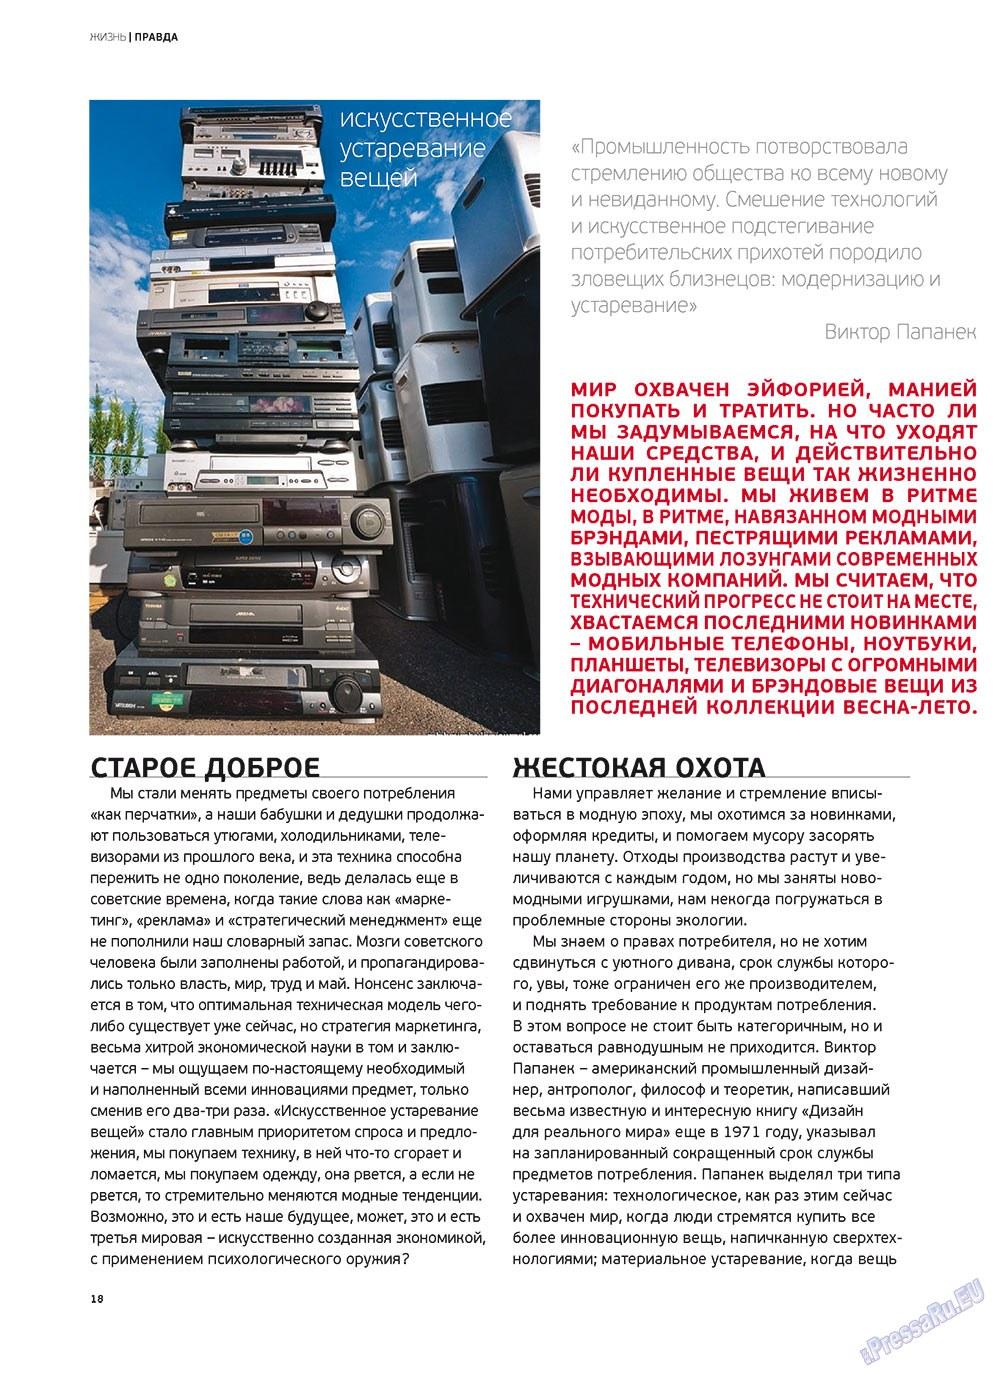 Артек (журнал). 2012 год, номер 2, стр. 20